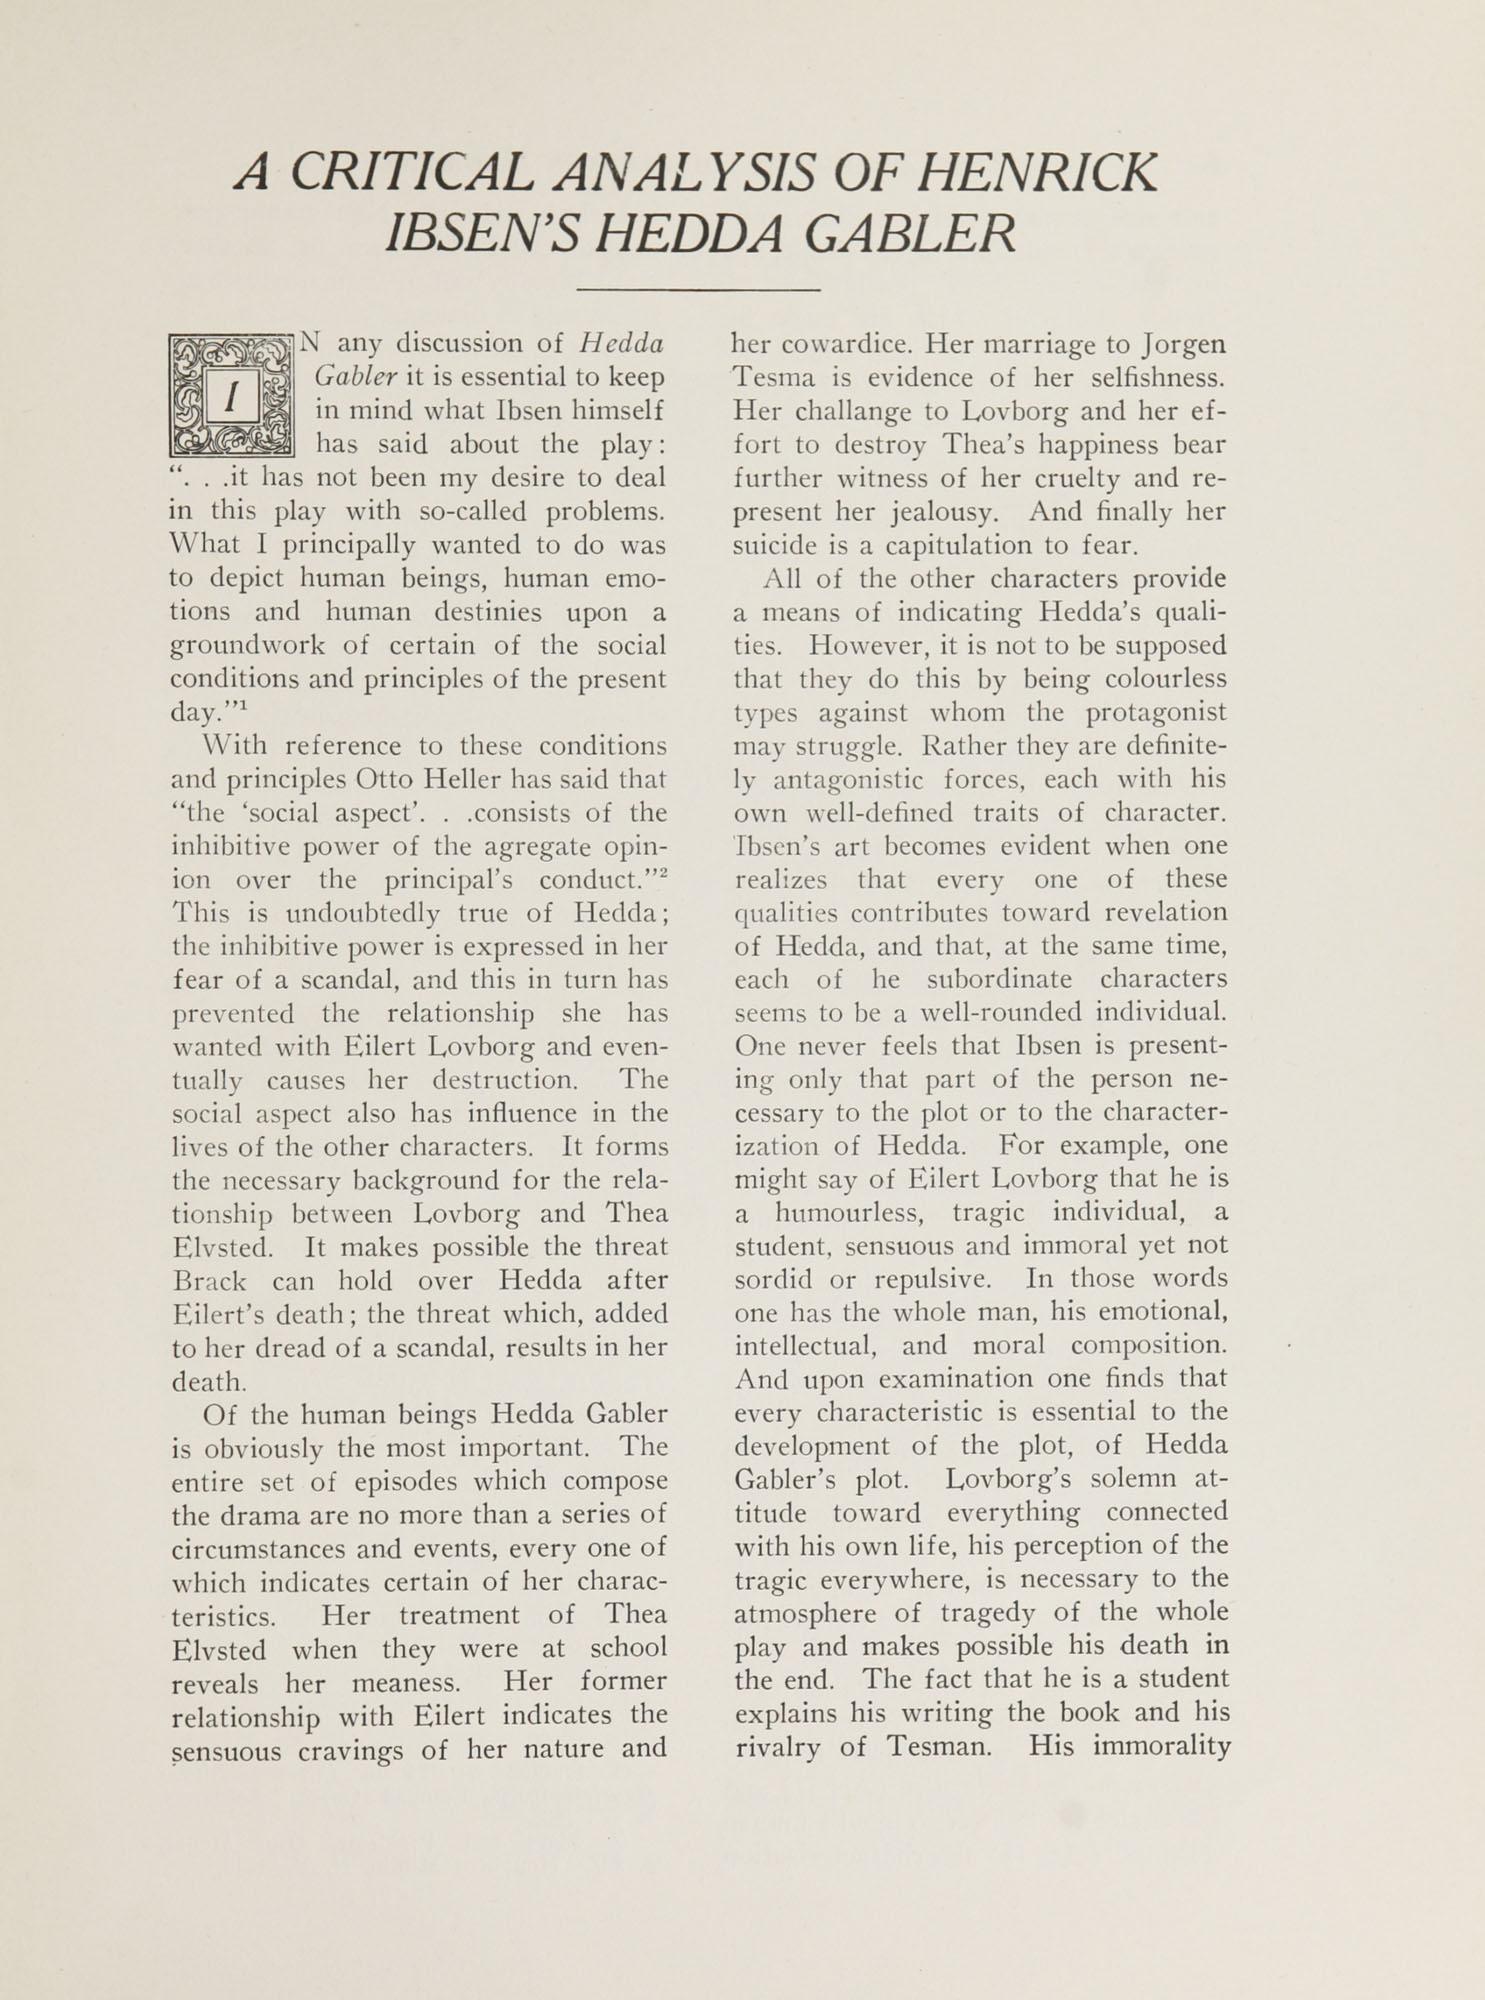 College of Charleston Magazine, 1937-1938, Vol. XXXXI No. 1, page 5